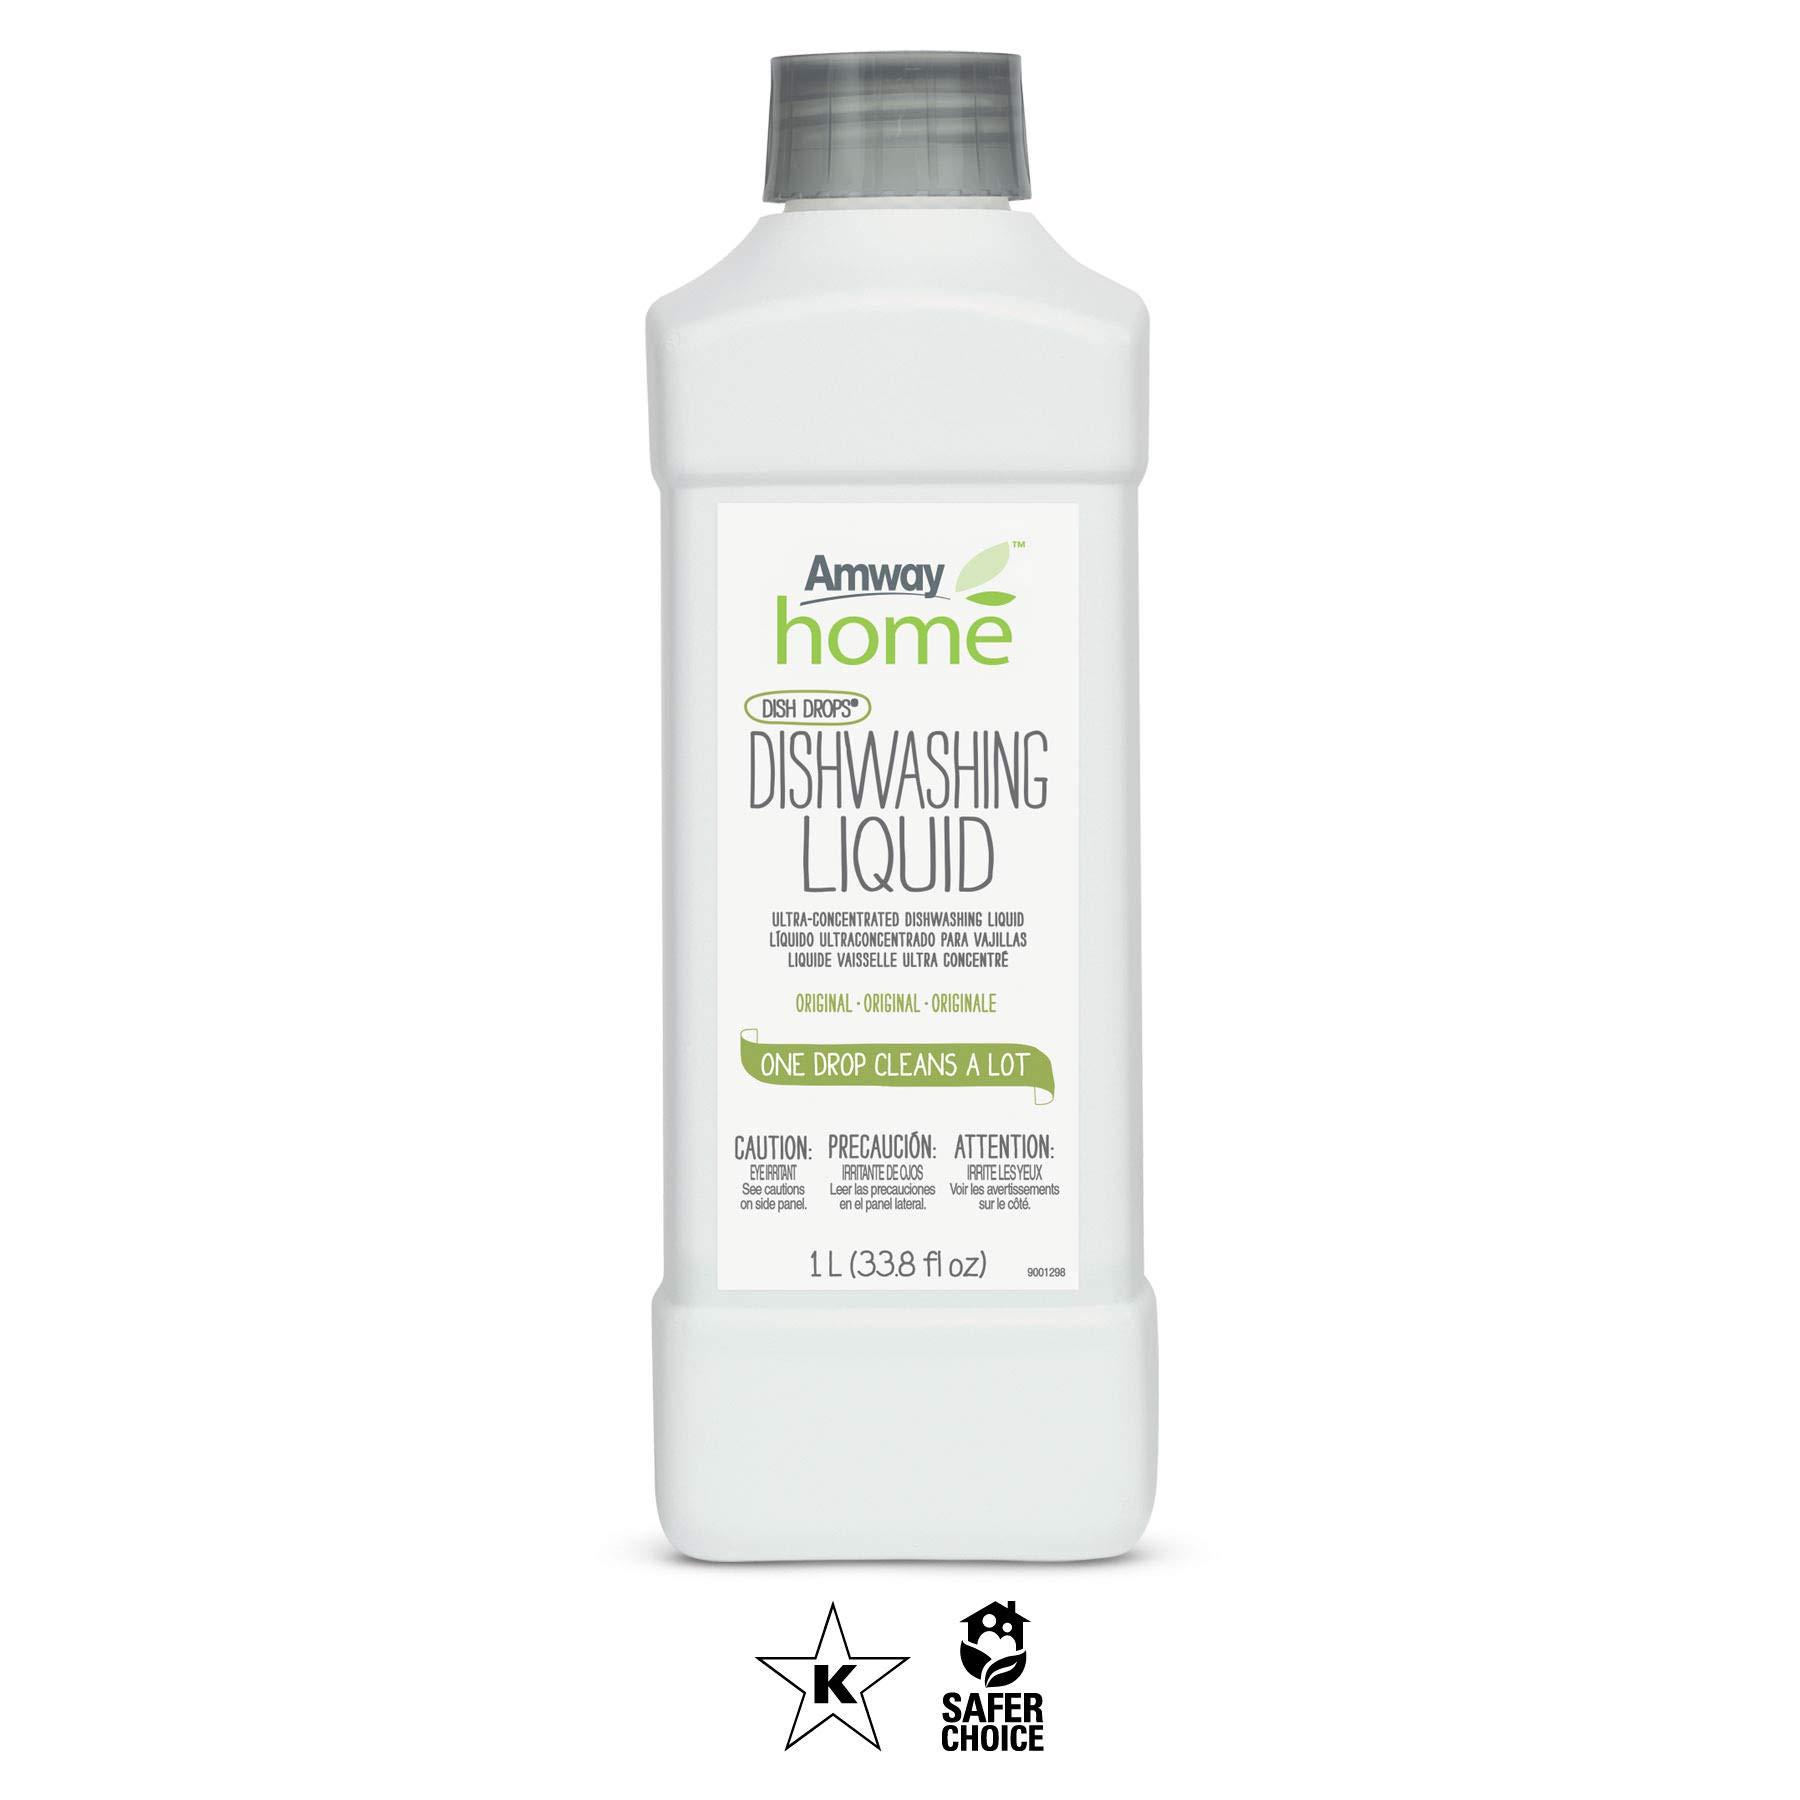 Amway Dish-Washing Detergent Refill - Dish Drop - 1L (33.8 fl oz) - Original Scent - One Drop Cleans A LOT!